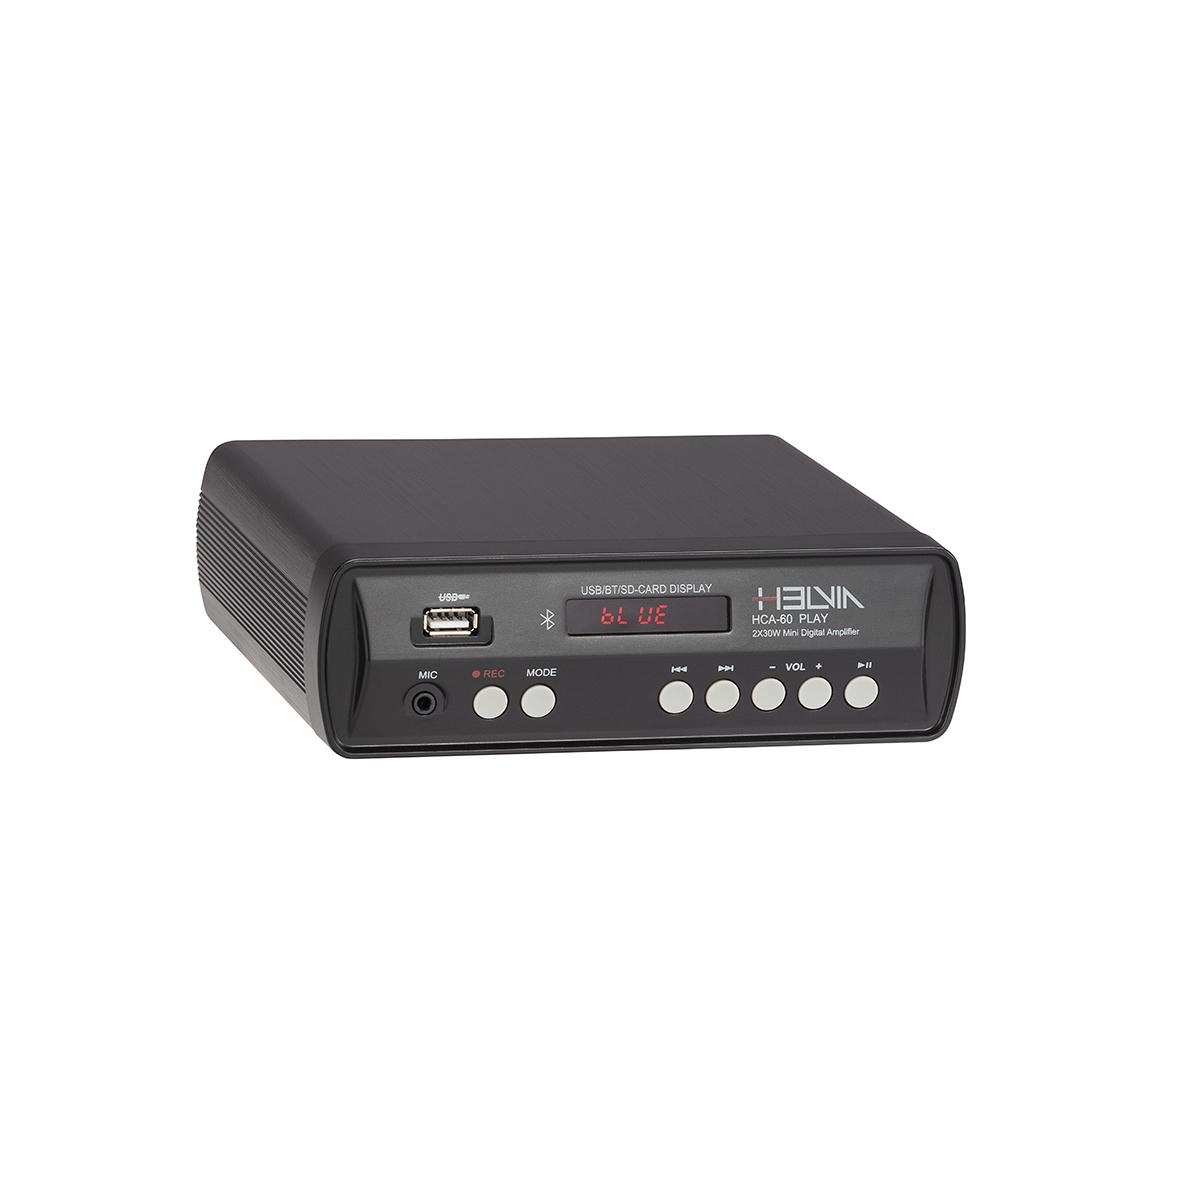 MINI STEREO AMP HELVIA HCA-60 PLAY 2X30W